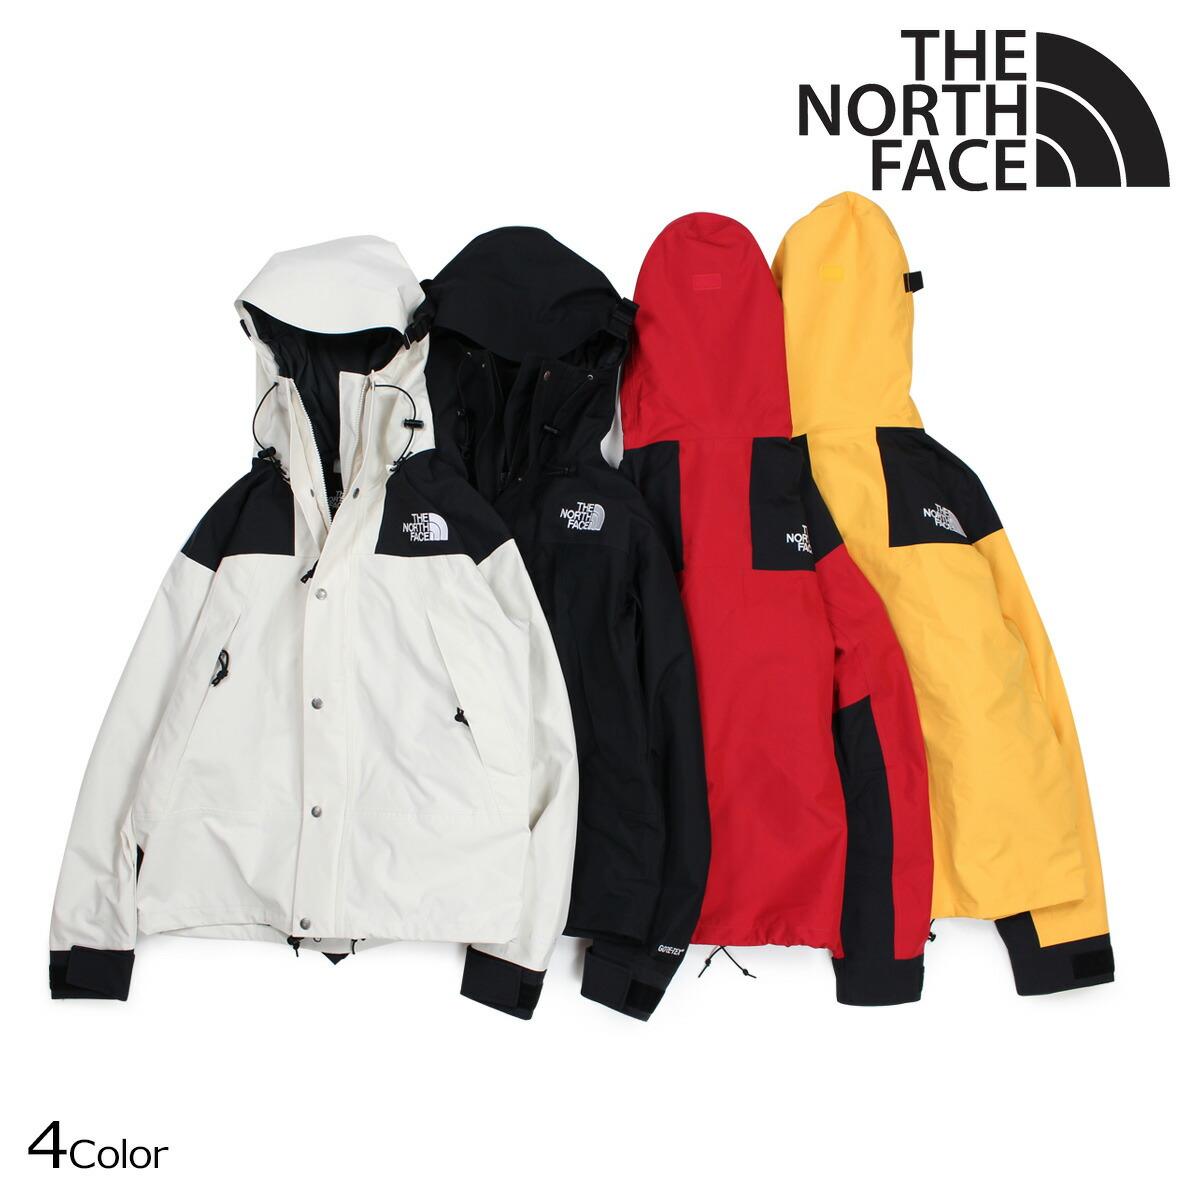 99306a616 THE NORTH FACE MENS 1990 MOUNTAIN JACKET GTX North Face jacket mountain  jacket men Gore-Tex NF0A3JPA [1812]